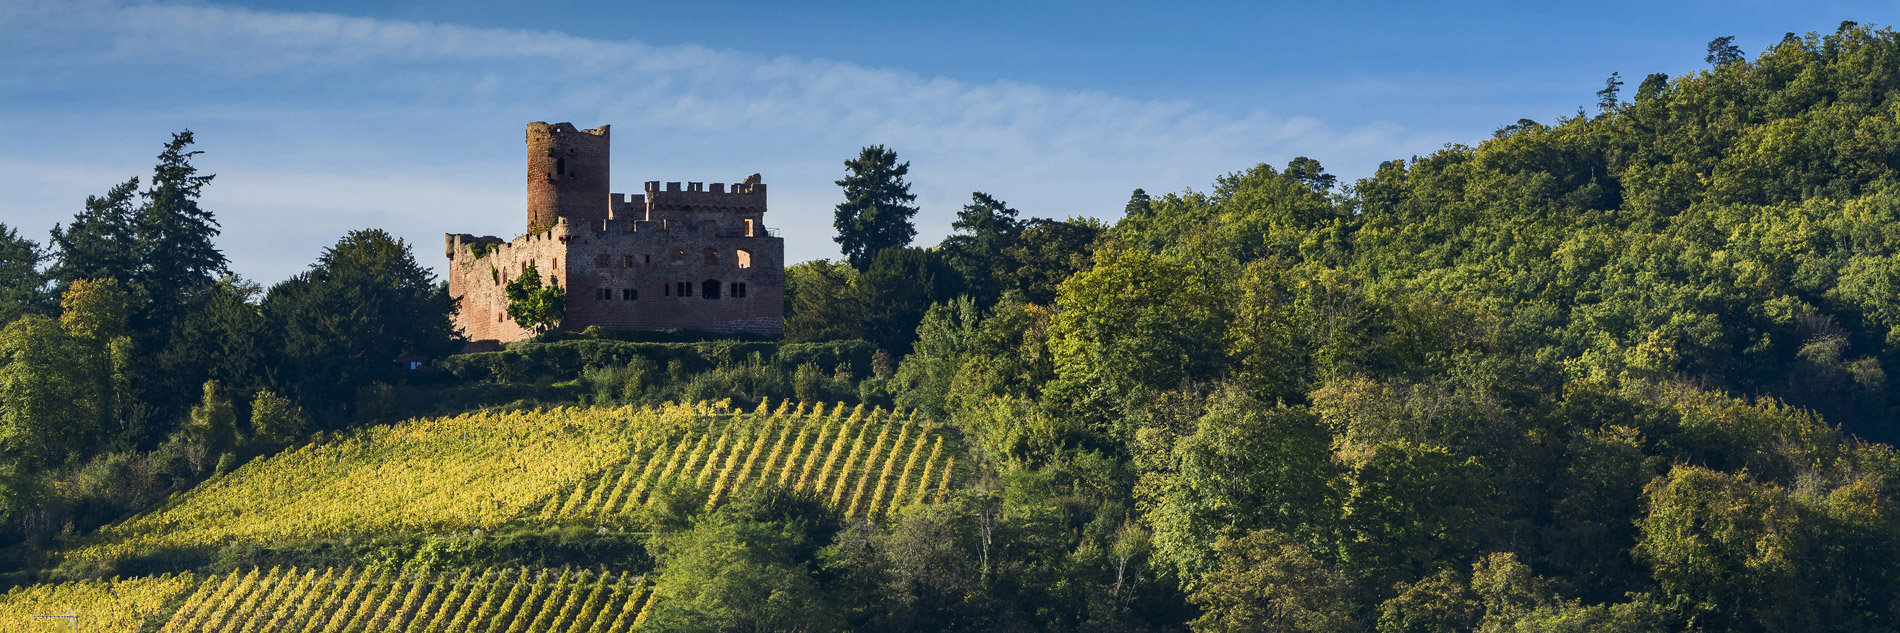 Château de Kientzheim